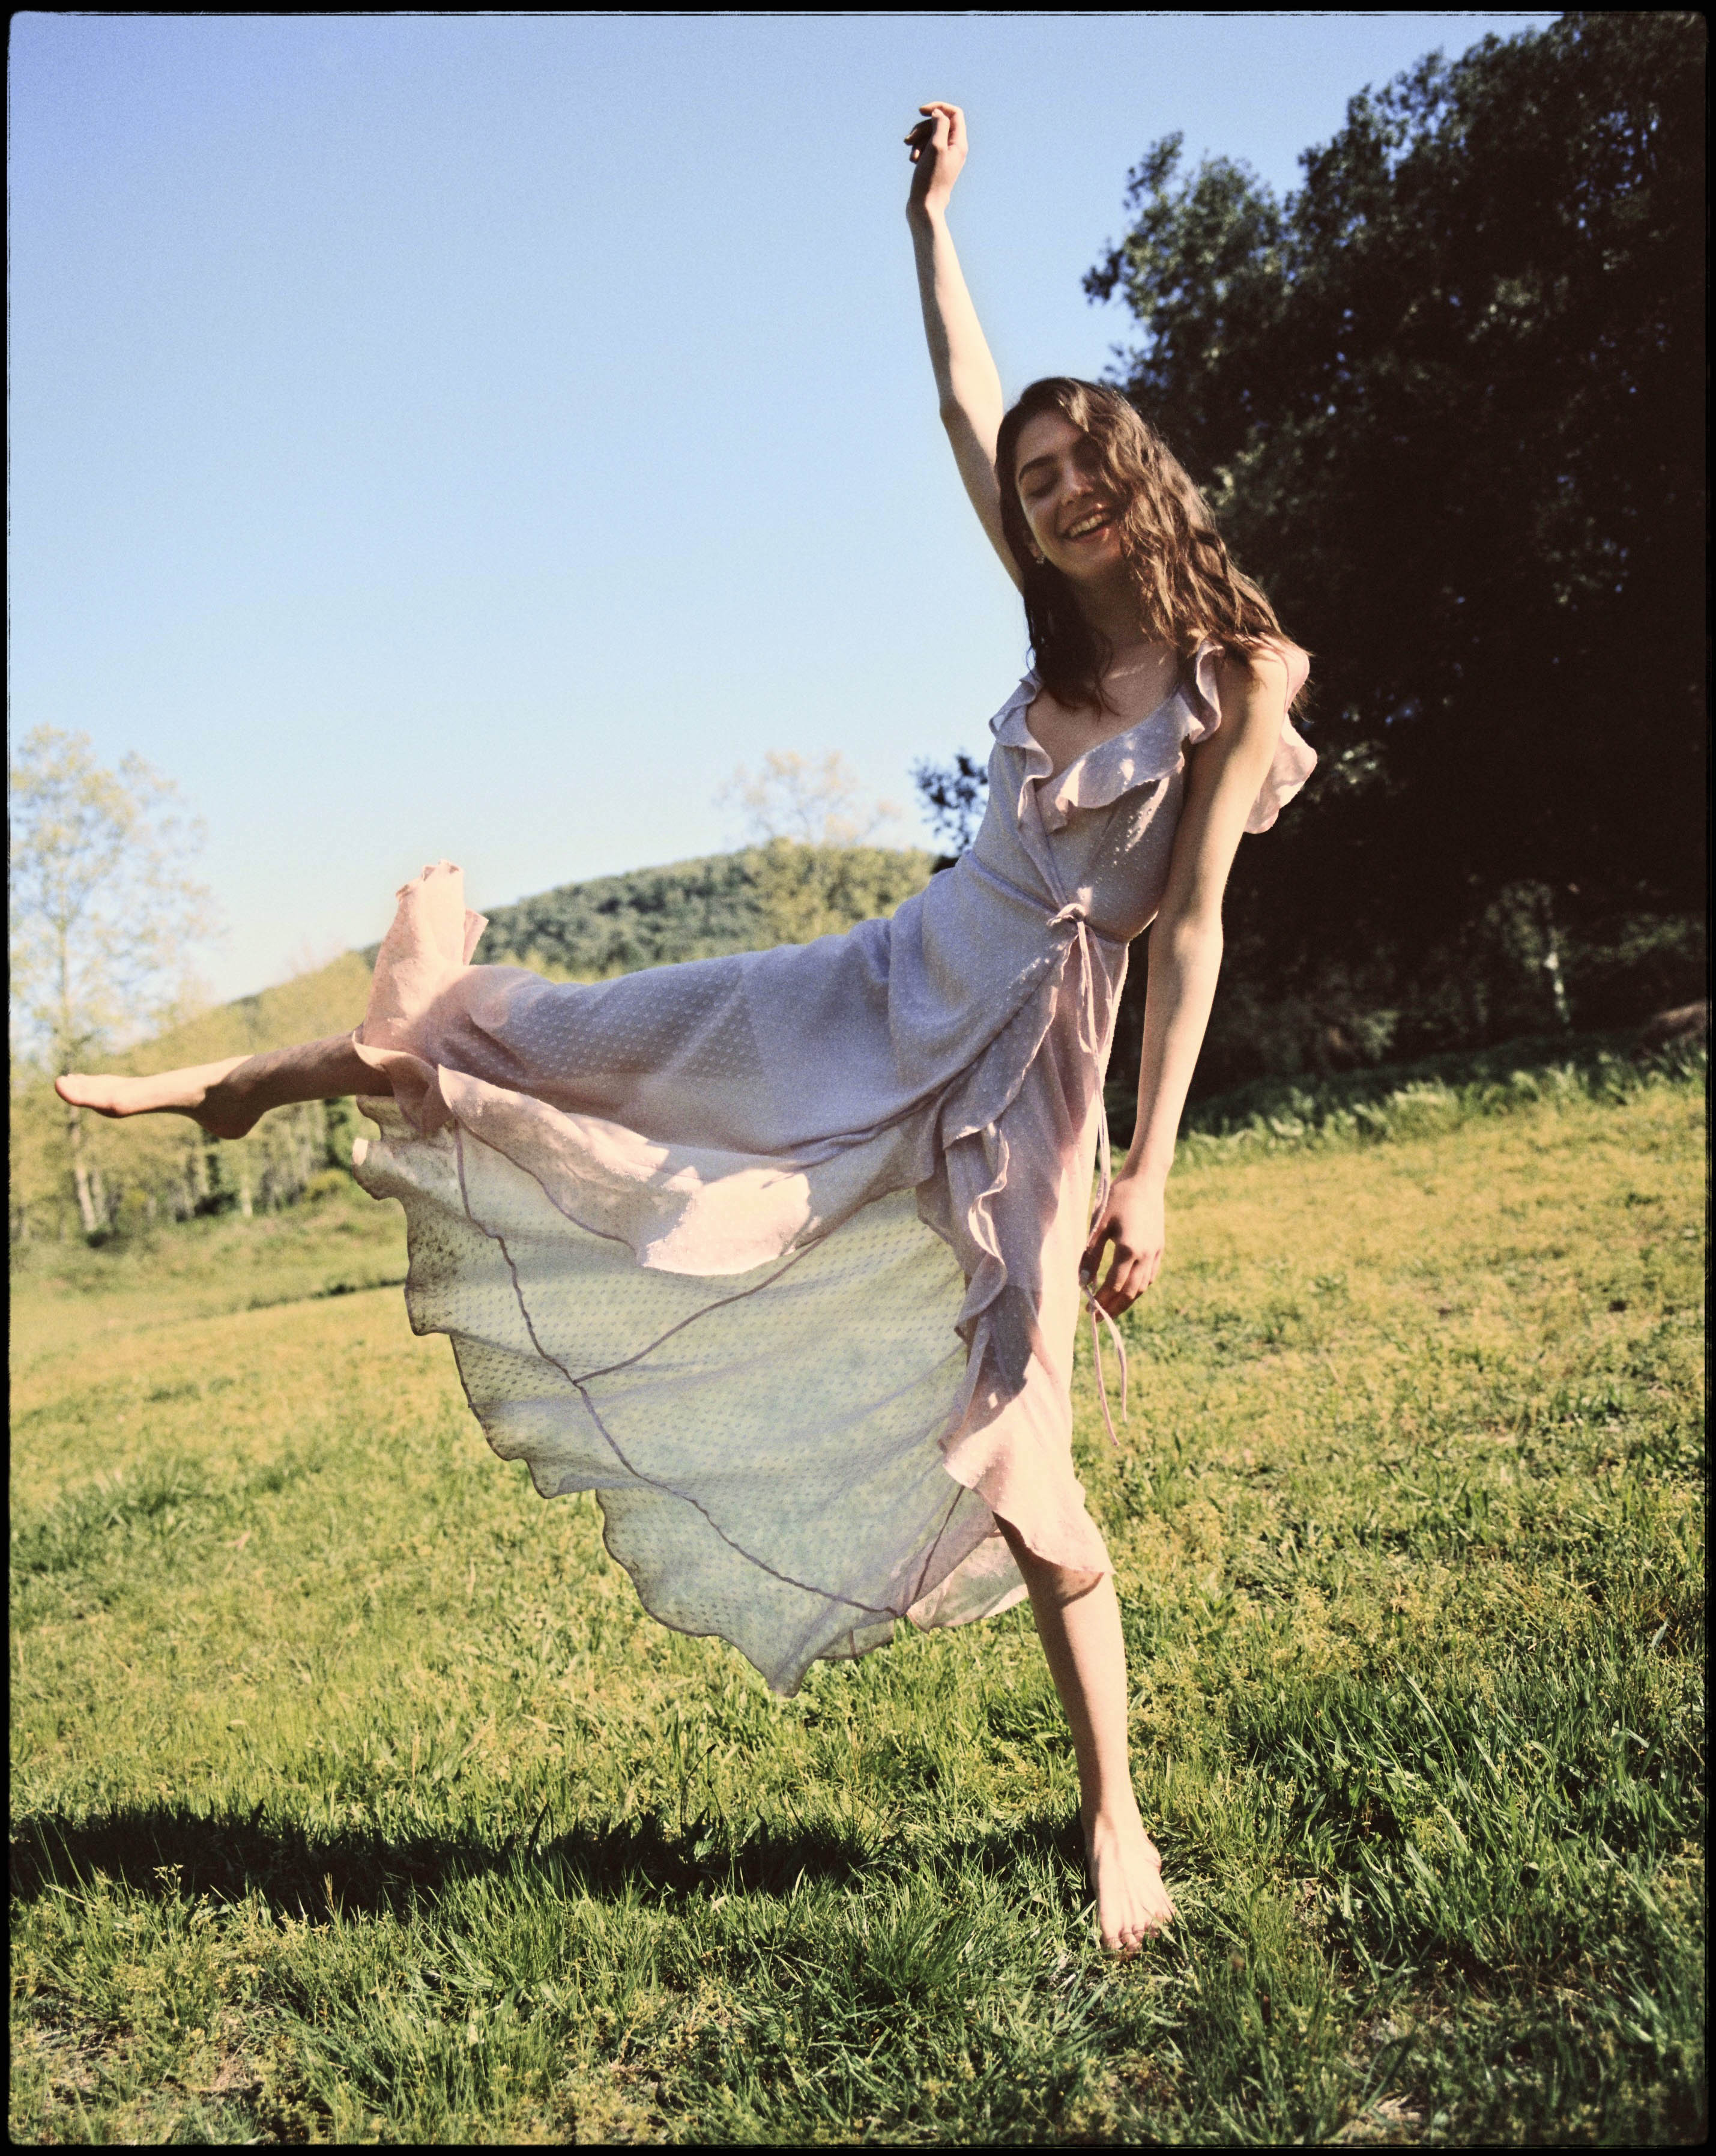 bershka-woman-let-it-bloom-4